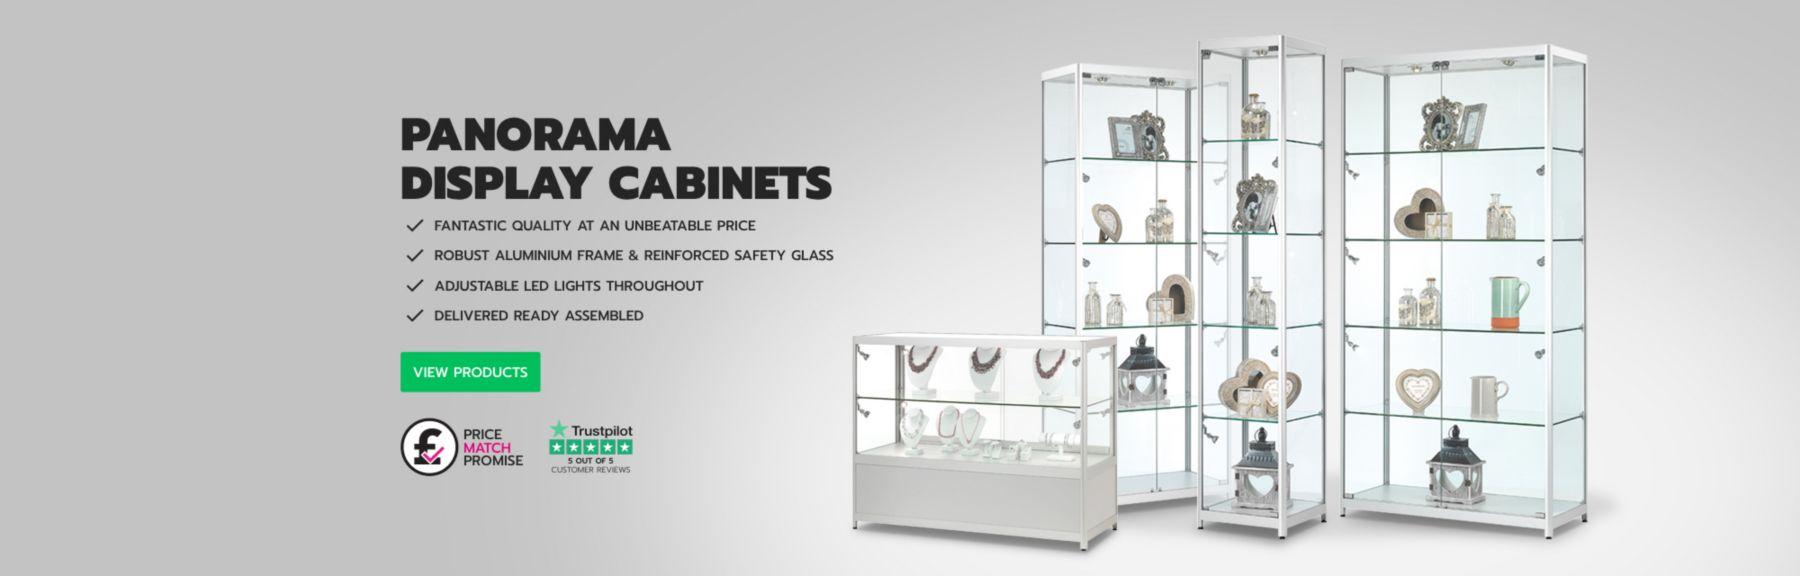 Panorama Display Cabinets